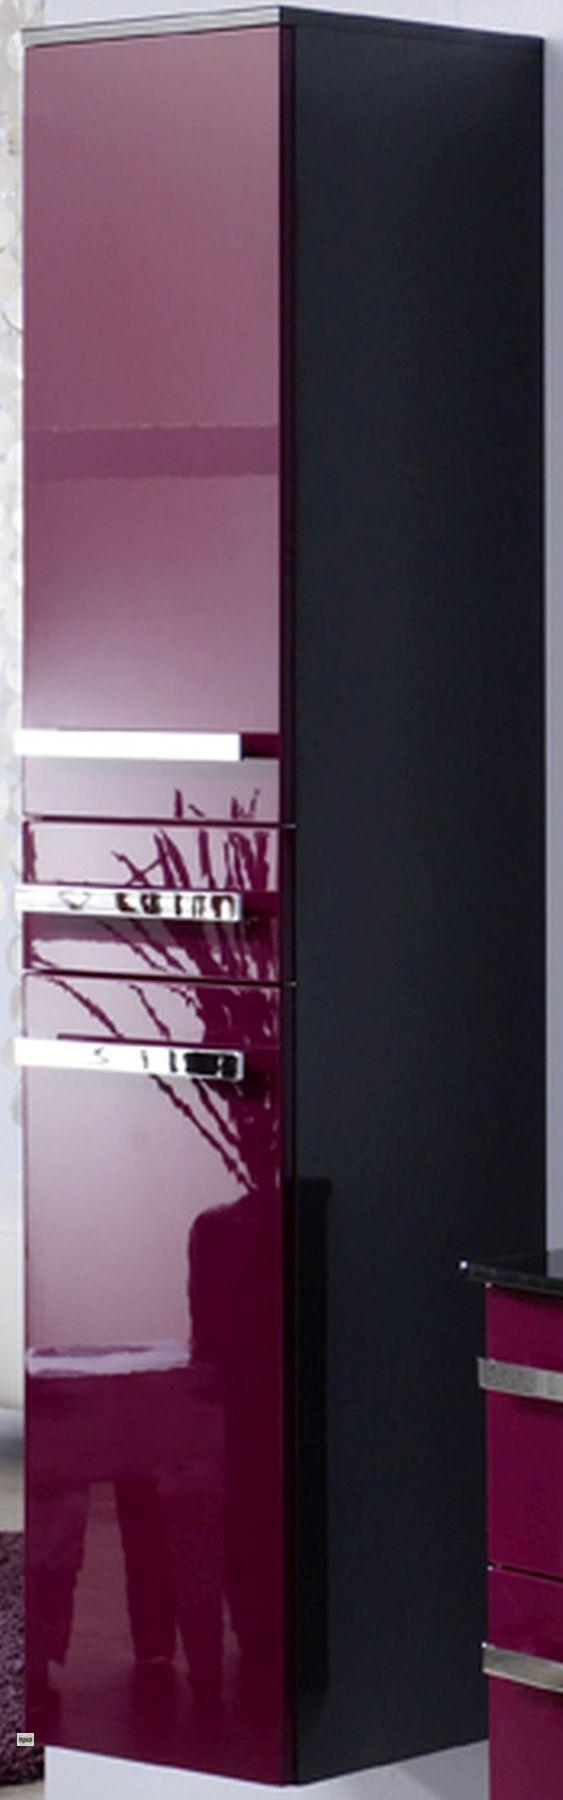 3 tlg badm bel set komplett waschplatz glasbecken. Black Bedroom Furniture Sets. Home Design Ideas